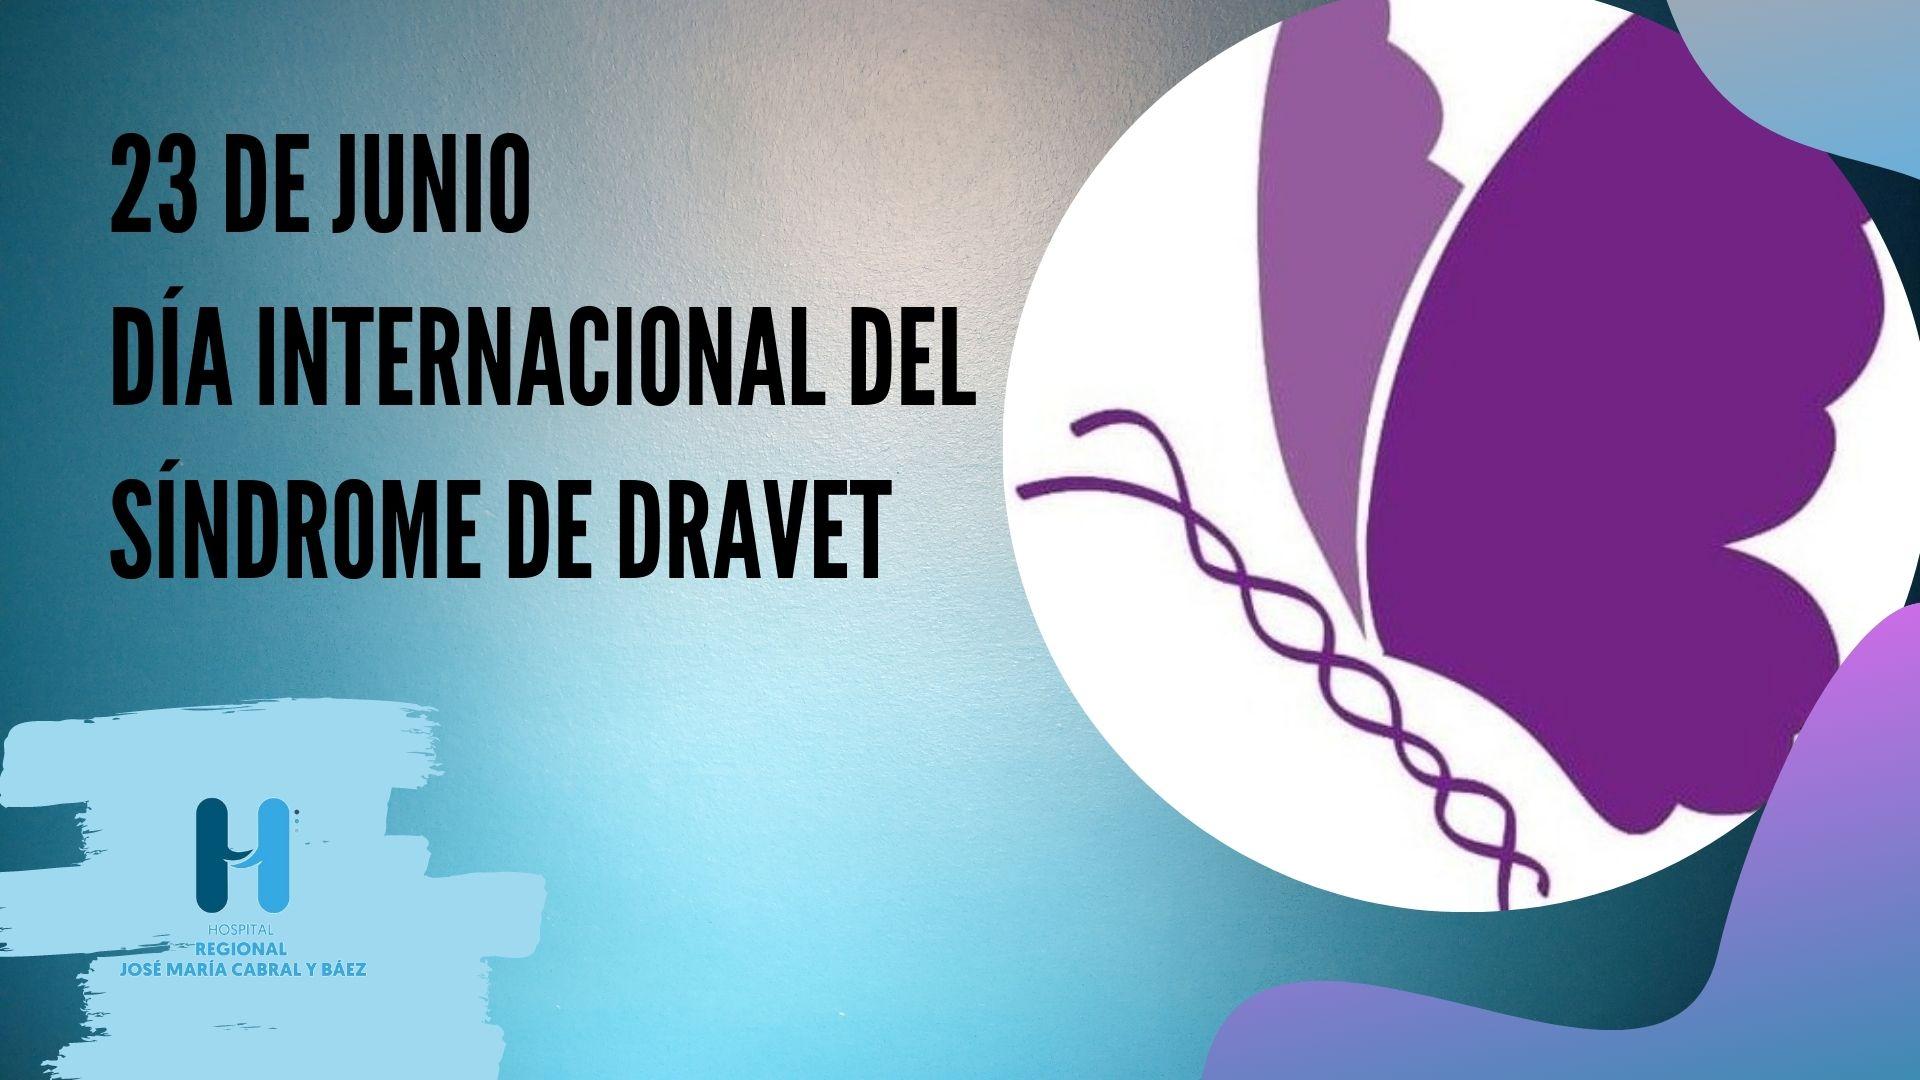 ¿Qué es el Síndrome de Dravet?